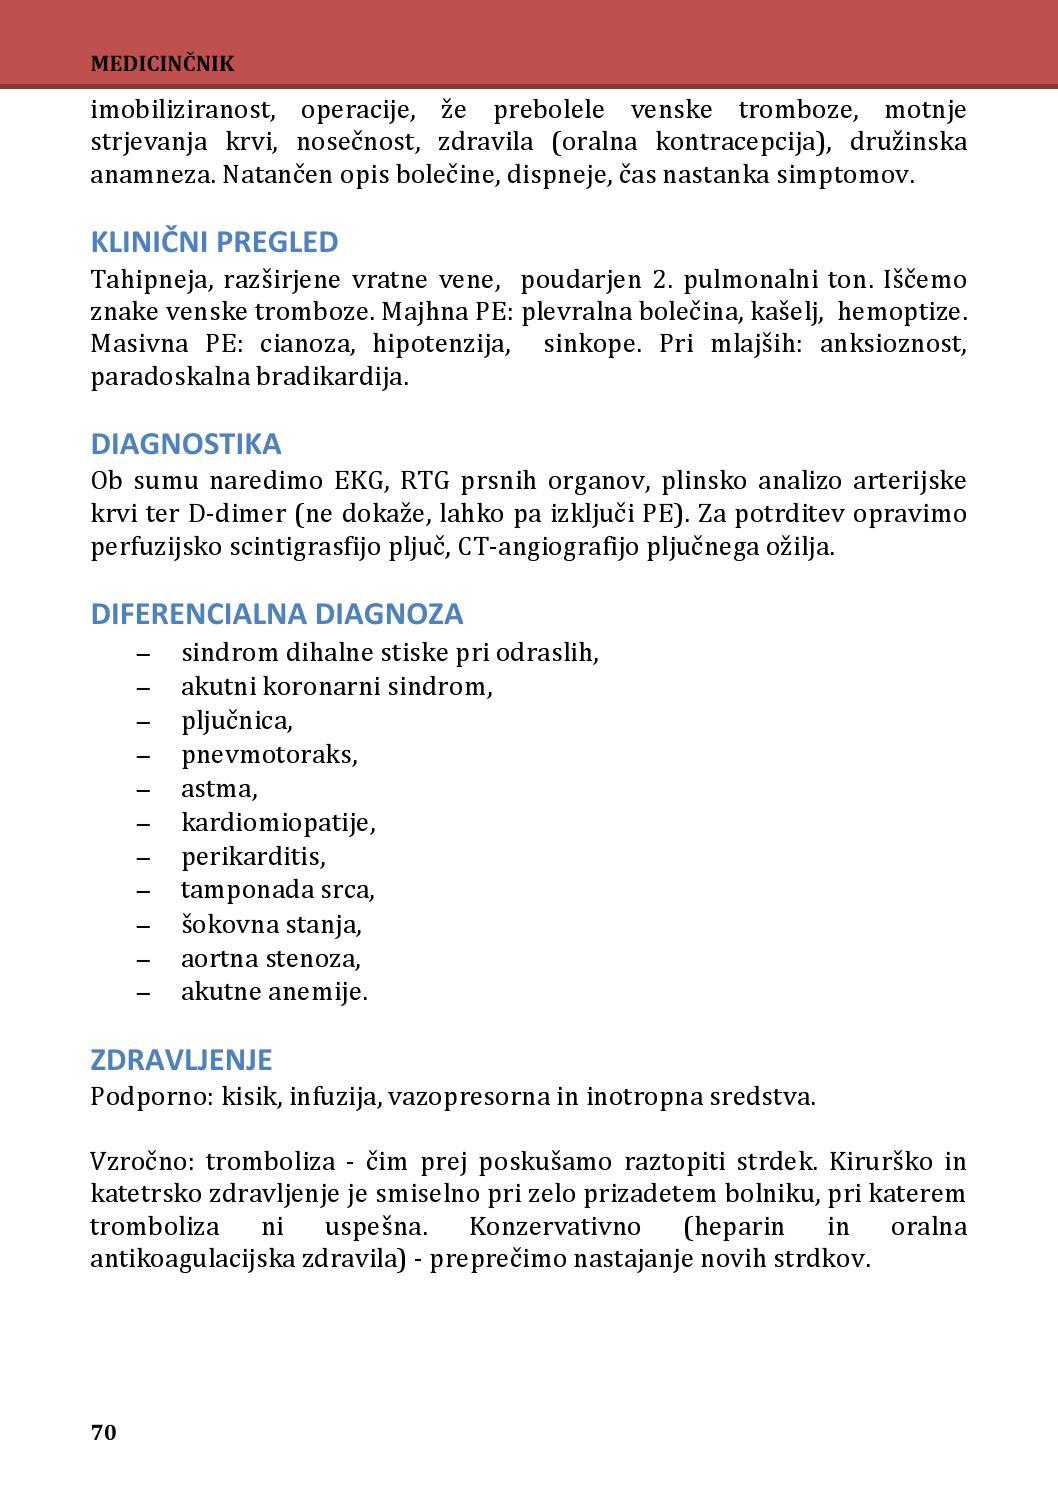 hipertenzijos sinkopė